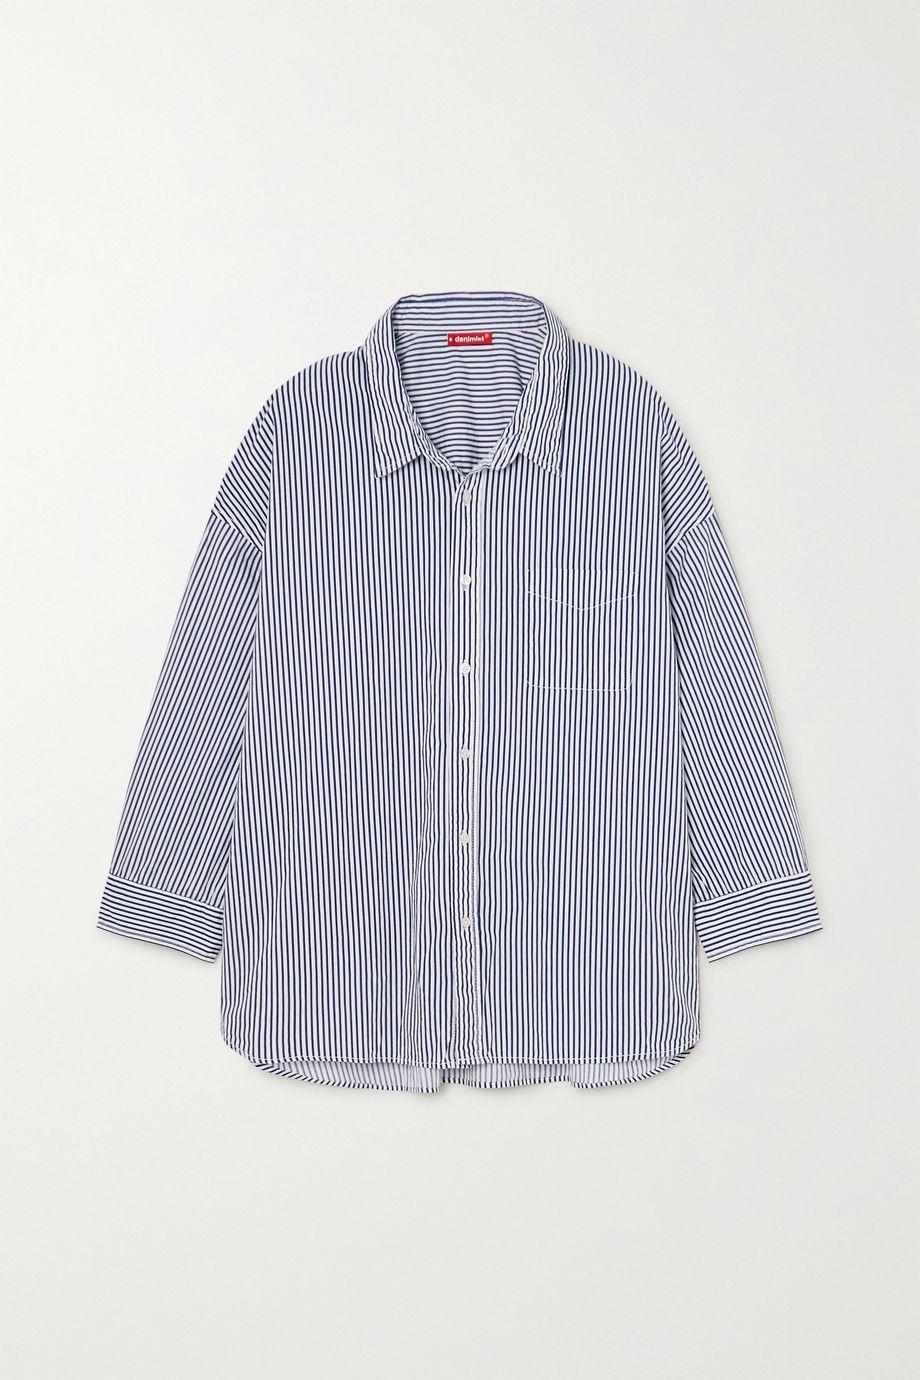 Denimist Striped cotton shirt